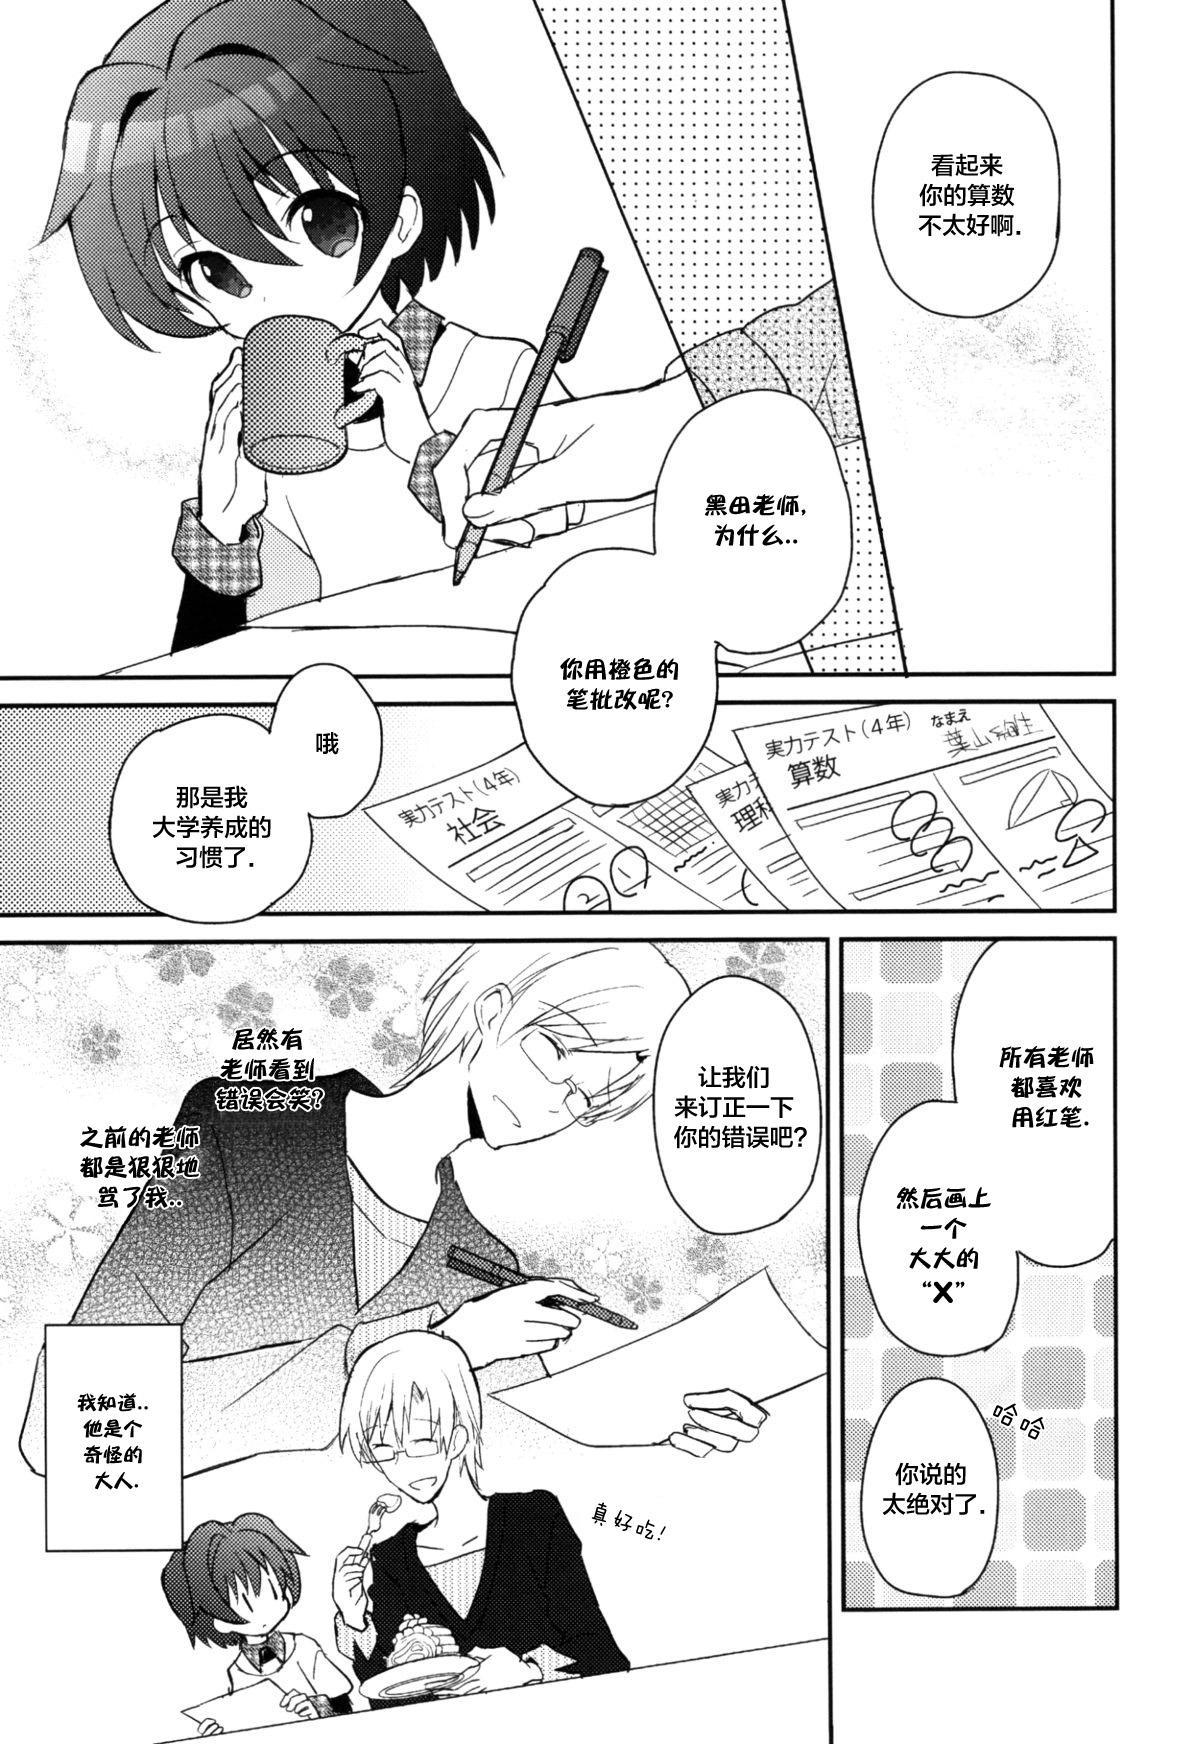 Sensei, Sensei 丨老师,老师 32